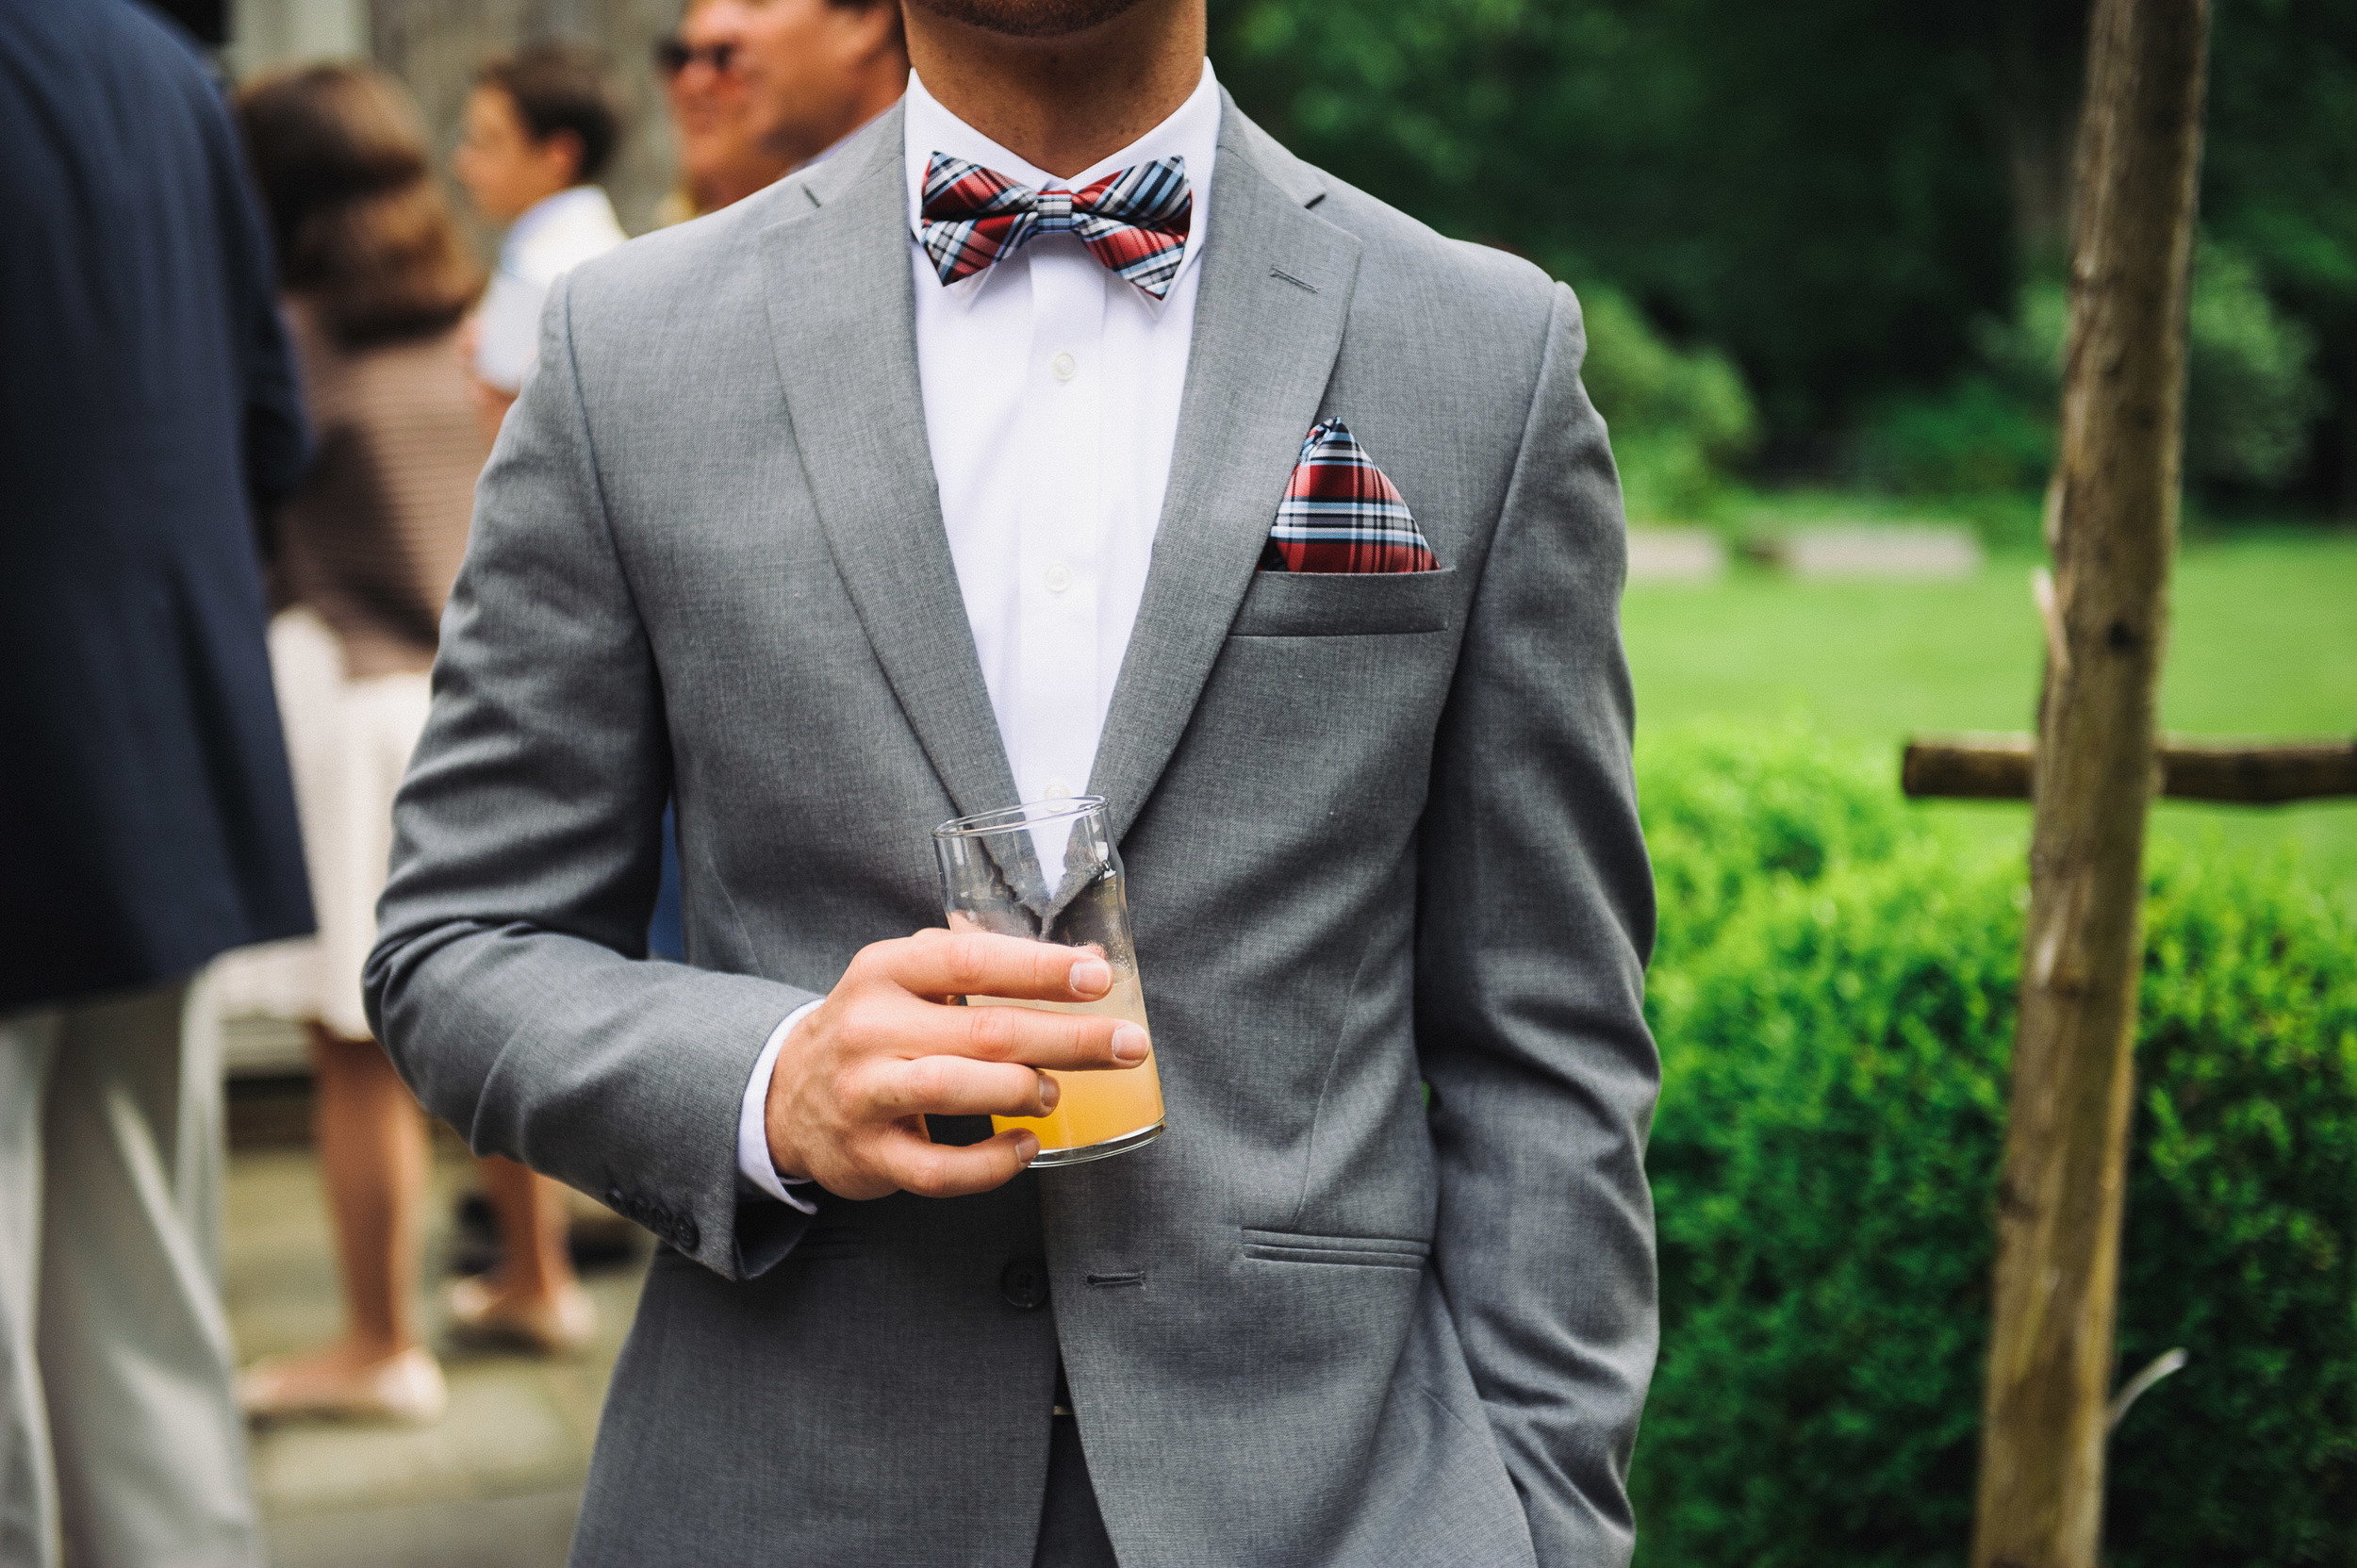 Same Sex Wedding CT Gay Wedding LGBT Wedding021.JPG